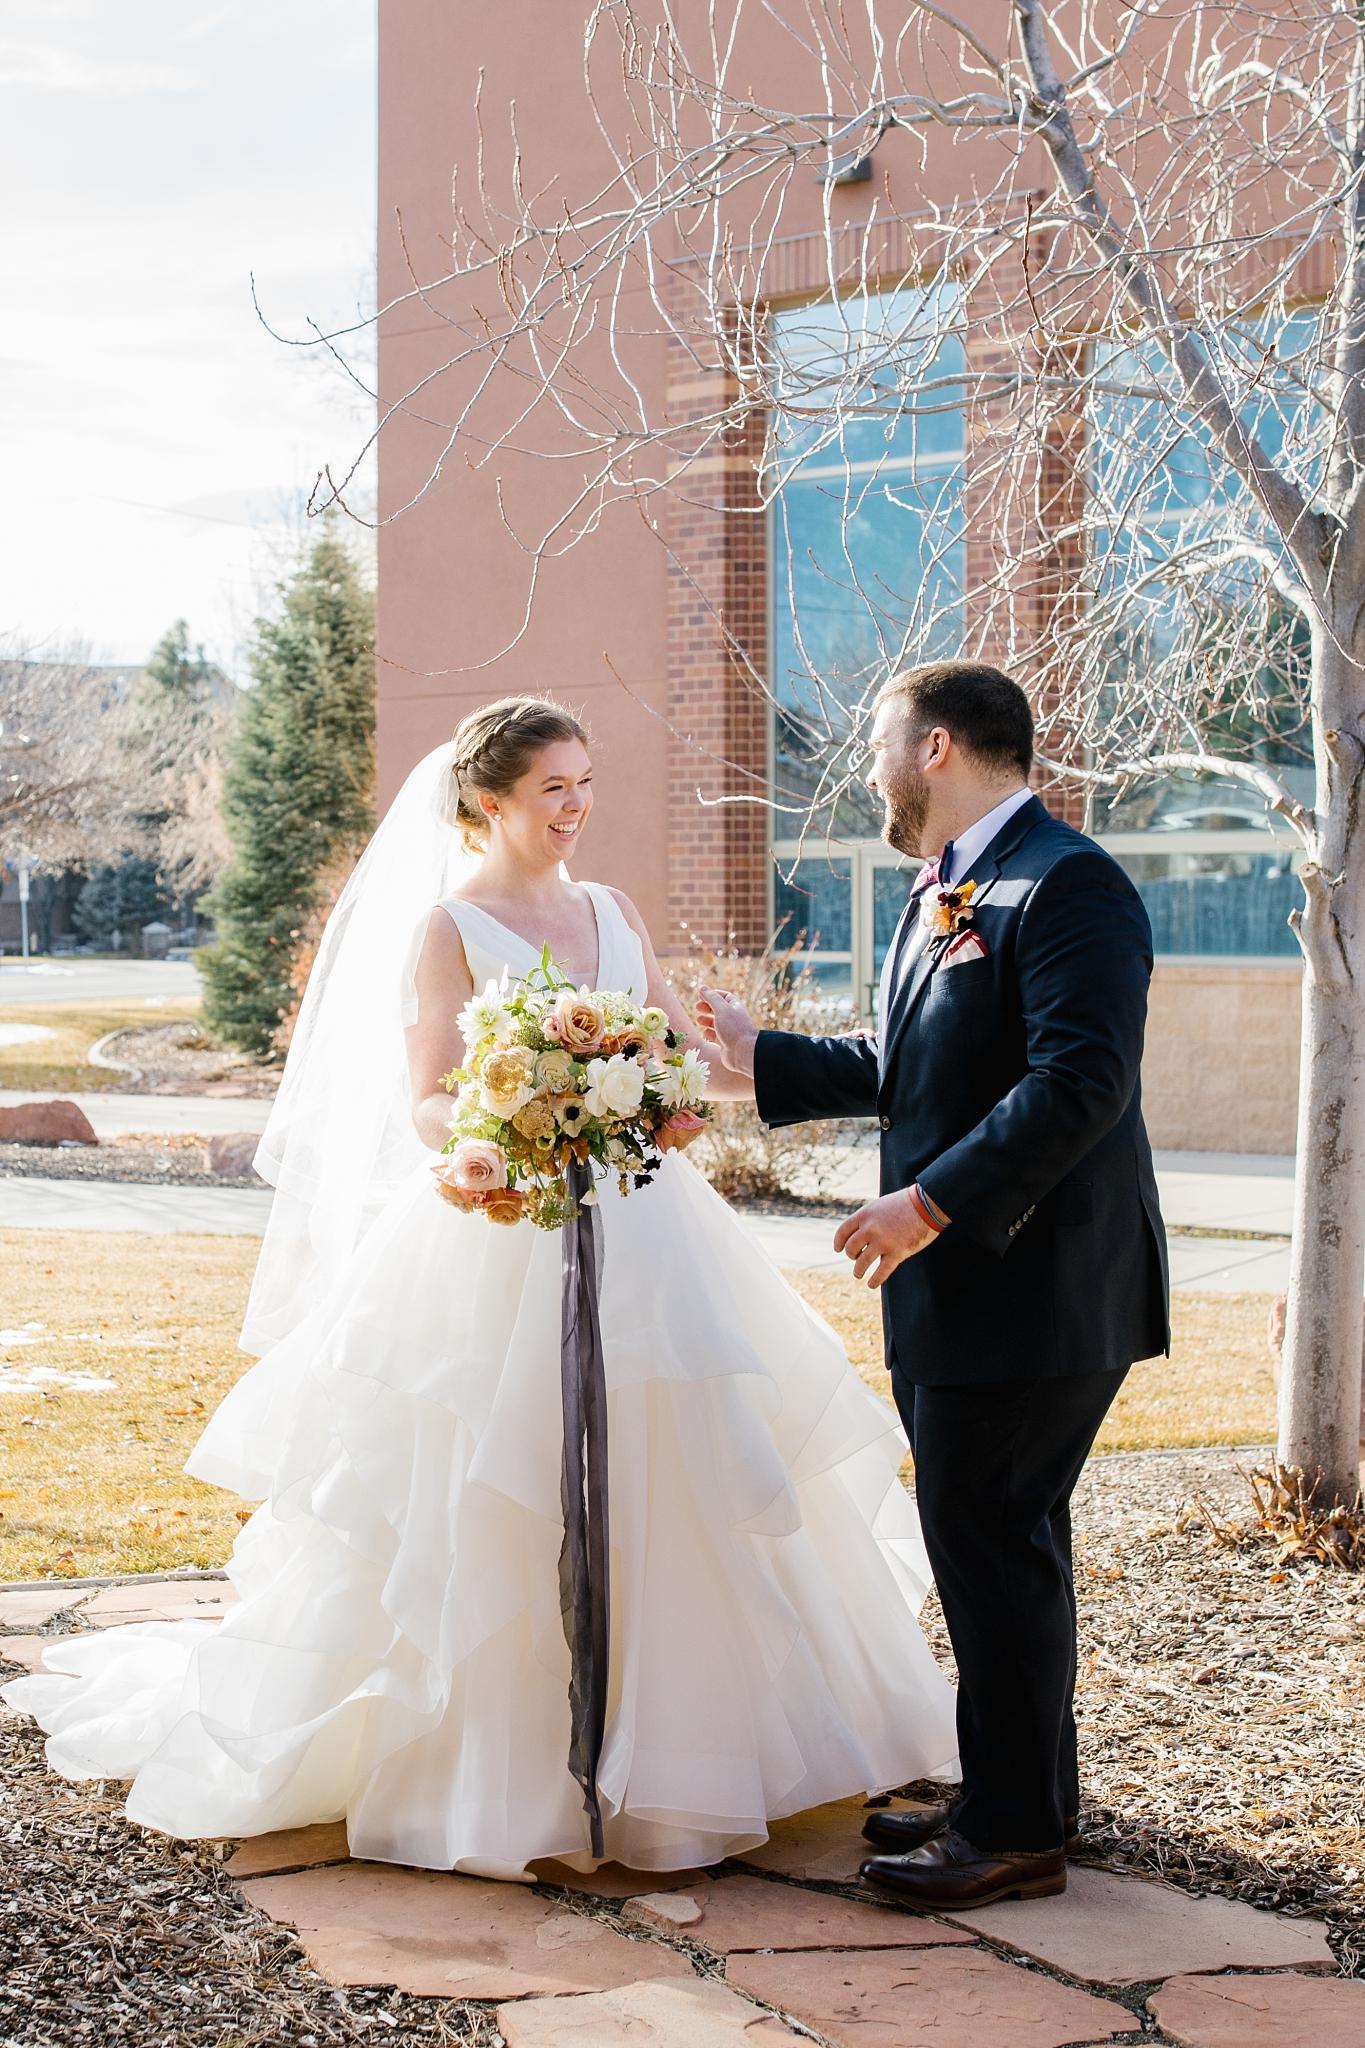 CN-Wedding-30_Lizzie-B-Imagery-Utah-Wedding-Photographer-Blessed-Sacrament-Catholic-Church-Sandy-Utah-The-Blended-Table-Salt-Lake-City.jpg